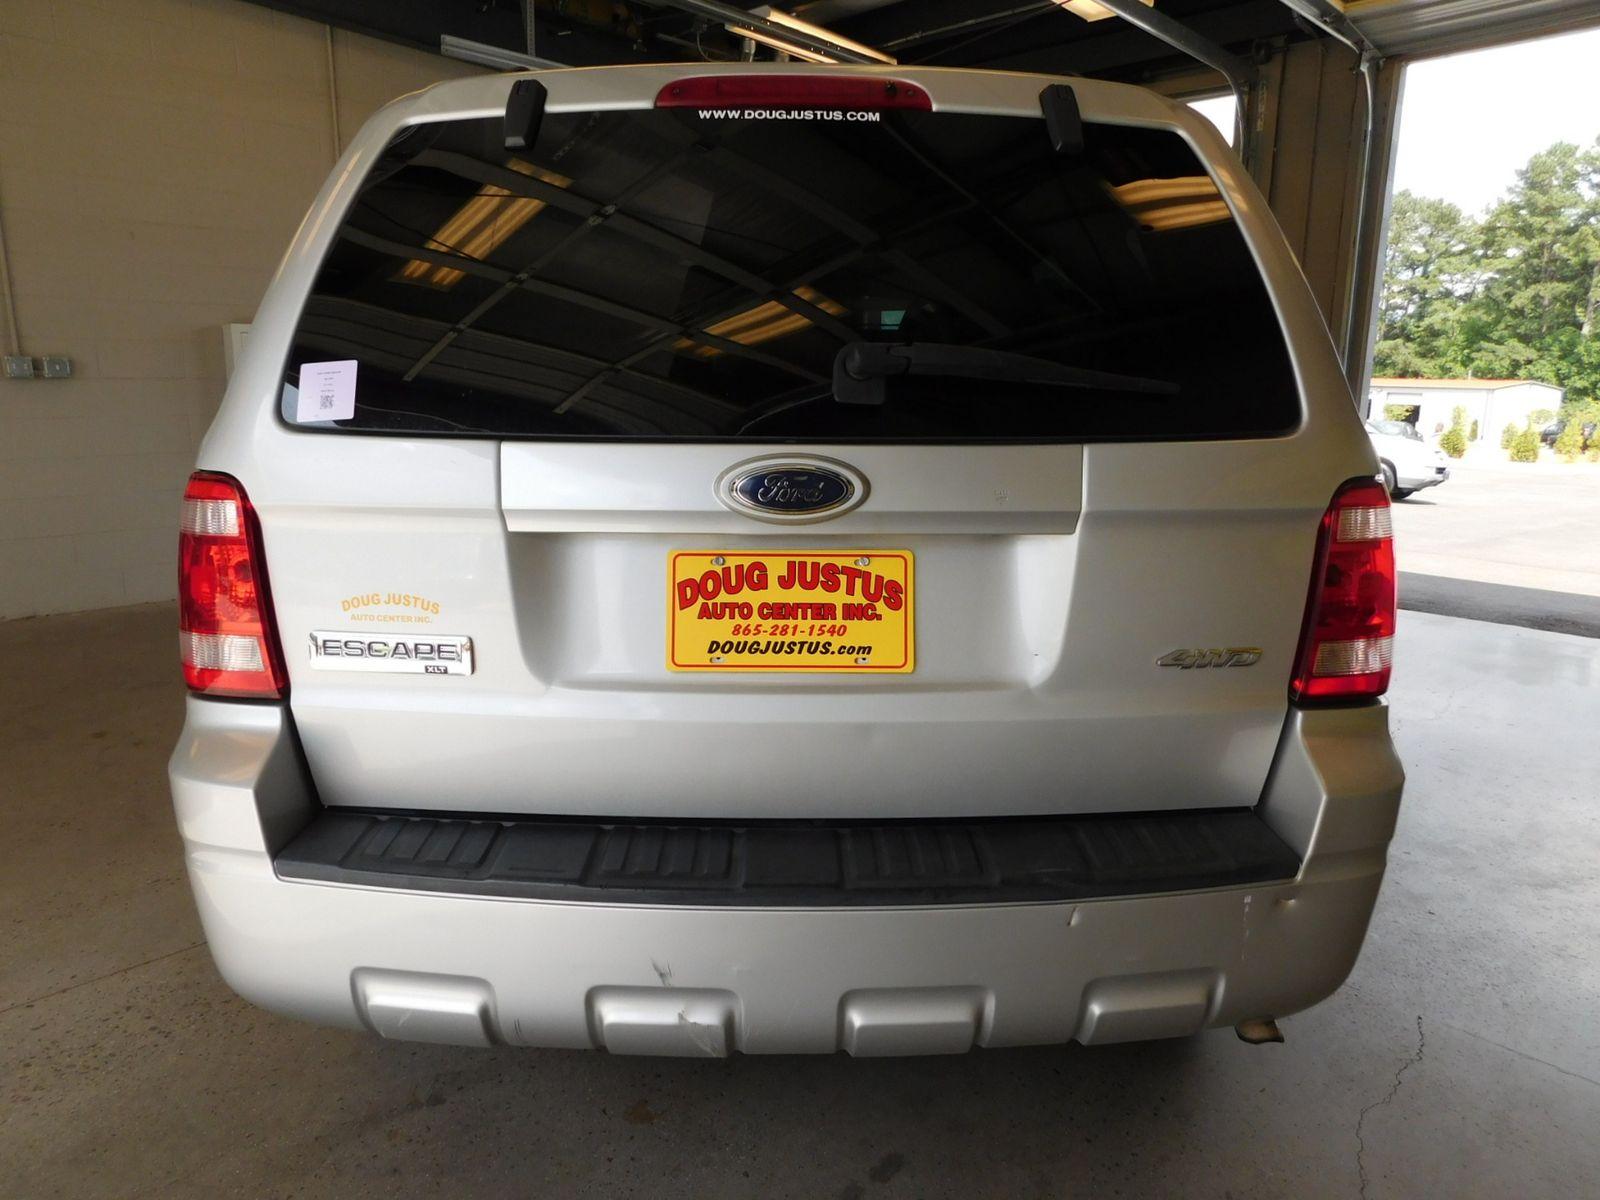 2009 ford escape xlt city tn doug justus auto center inc in airport motor mile